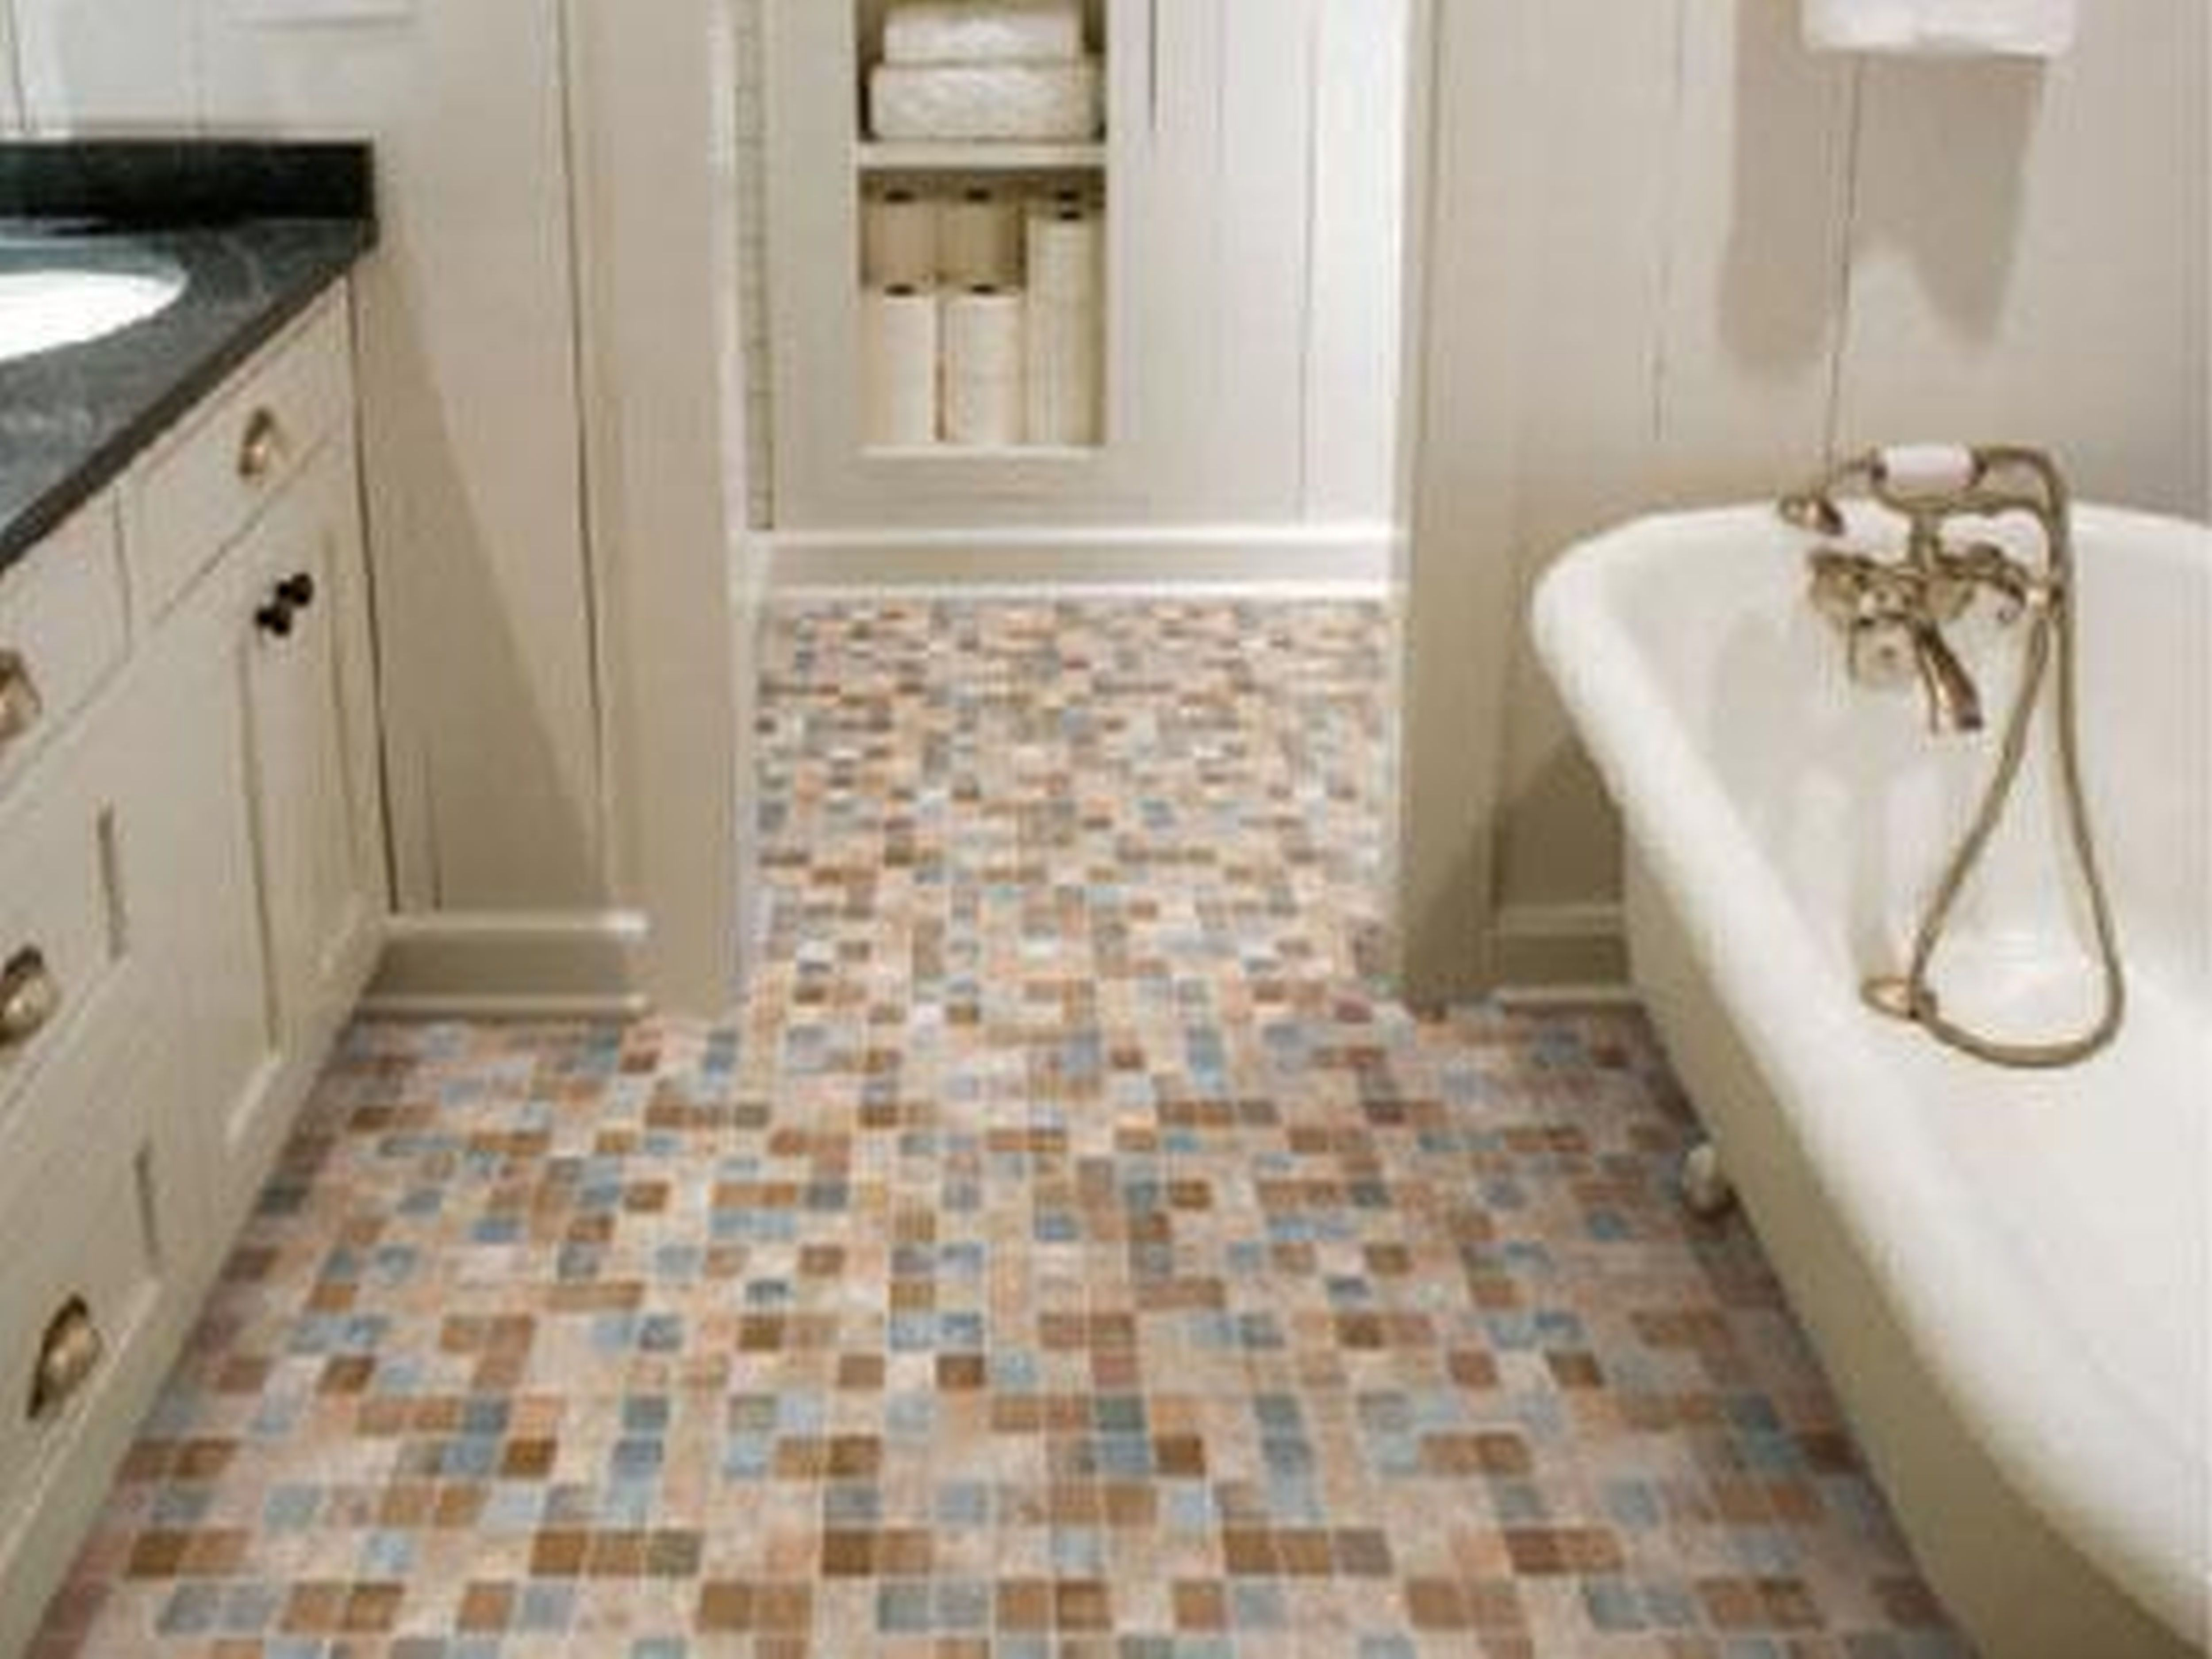 10 Incredible Bathroom Tile Floor Ideas For Small Bathrooms Get Ideas Bathroom Flooring Bathroom Floor Tiles Tile Floor